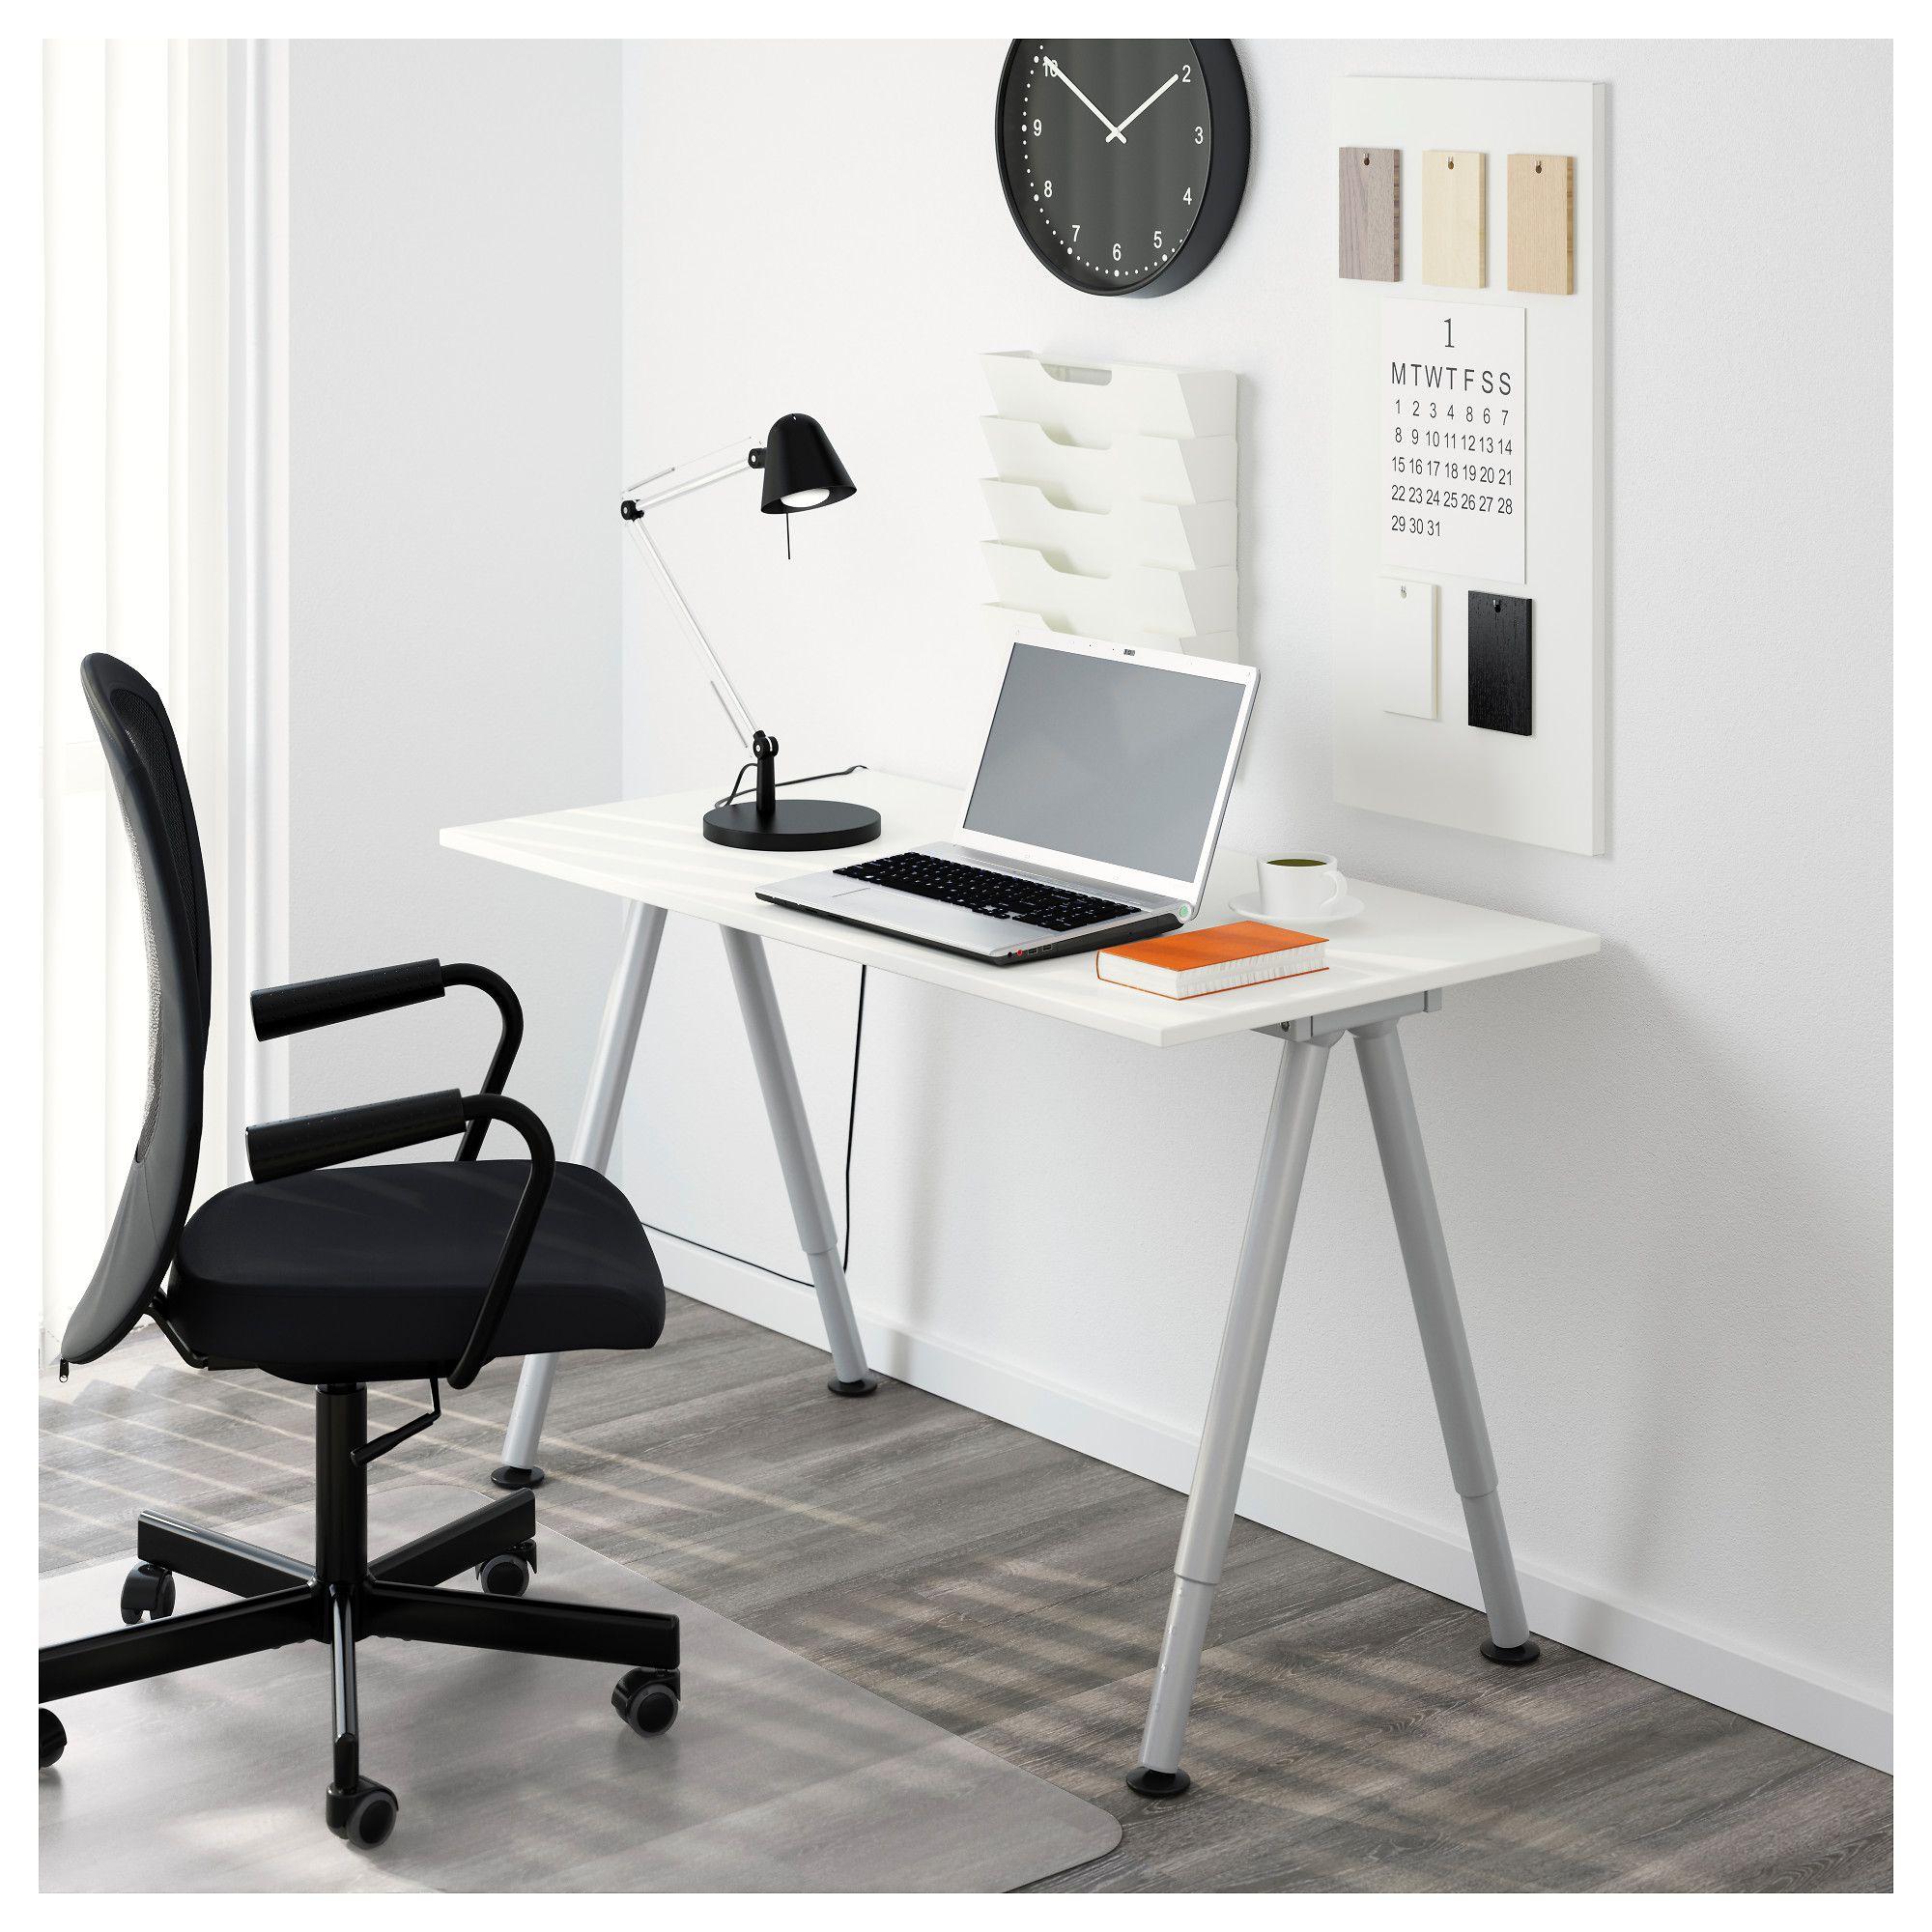 Thyge Desk White Silver Color Ikea Ikea Bekant Home Office Furniture Ikea Bekant Desk